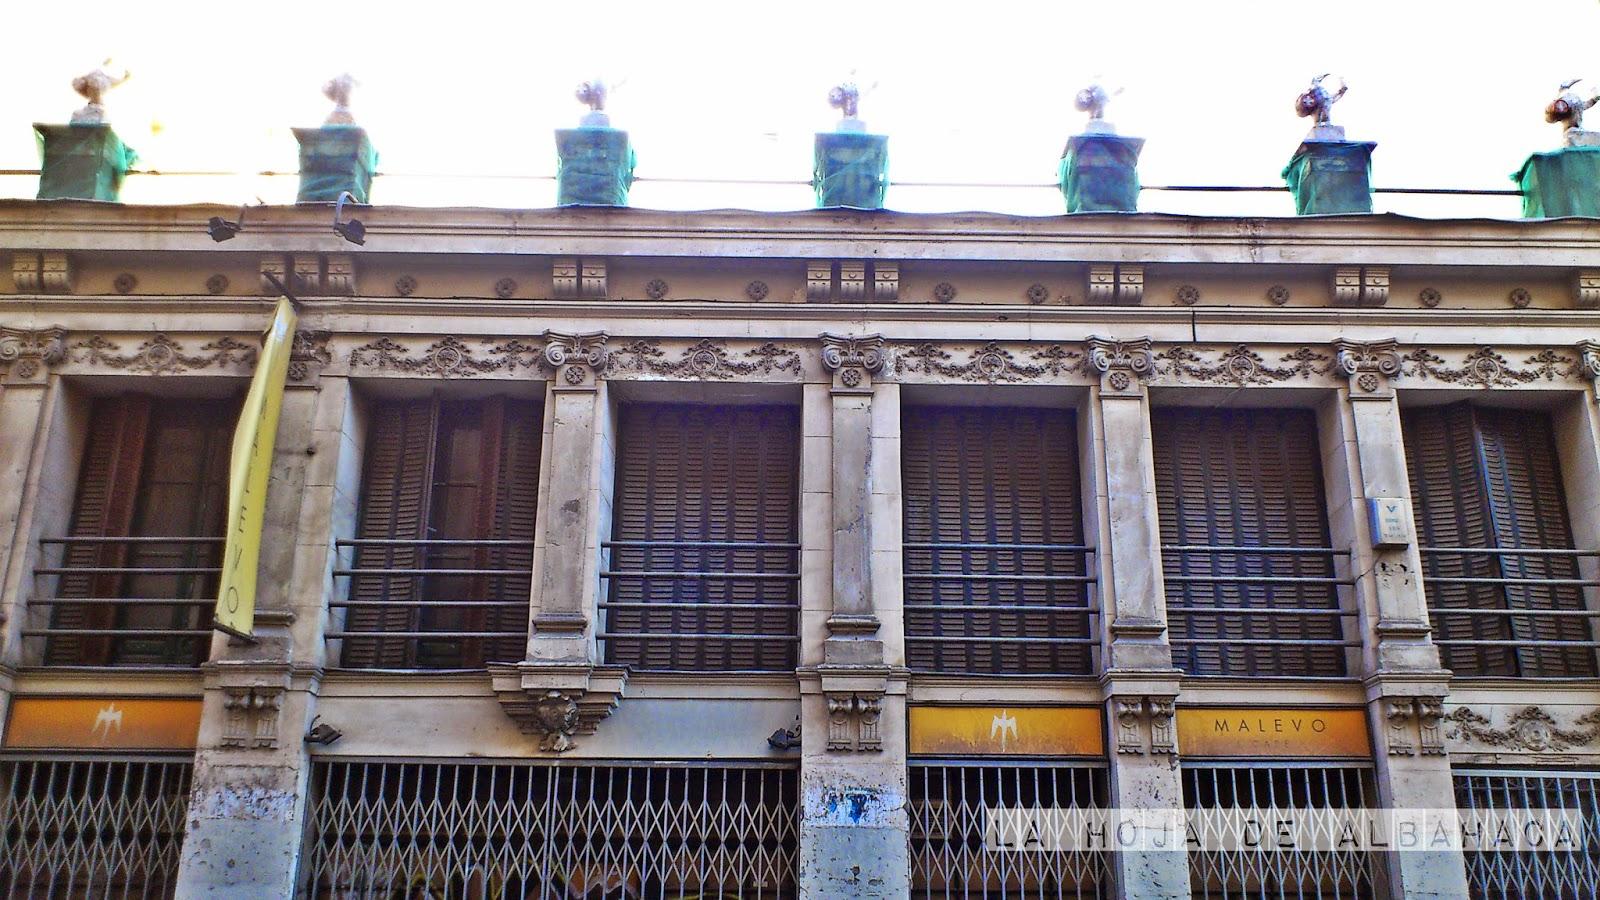 Madrid, calle Fernando VI, pingüinos, Cruz blanca, Cerveceriá Santa Barbara, Malevo, arquitectura